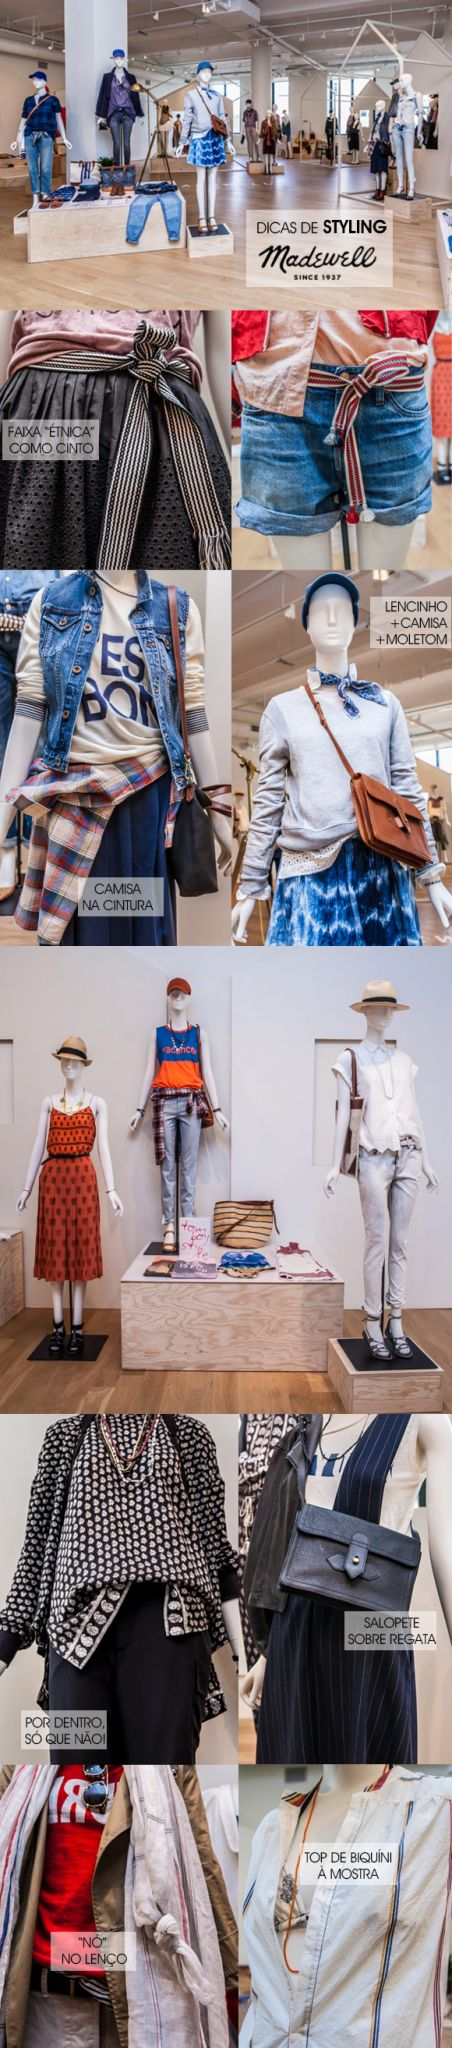 Achados da Bia | Moda | Styling | Lojas | Madewell